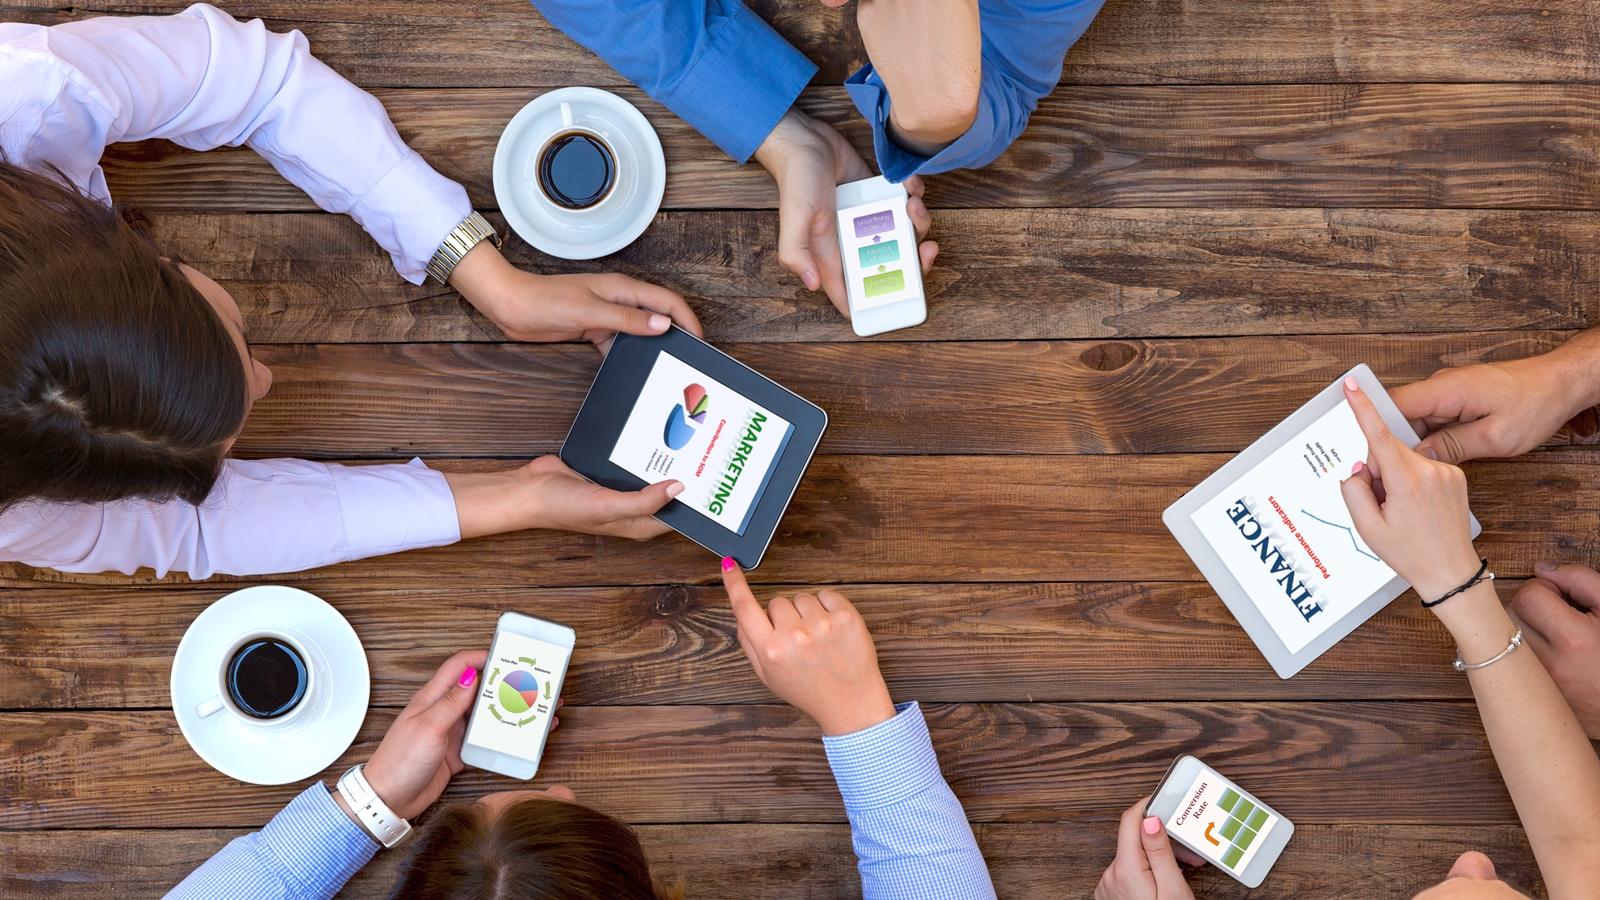 Influencer: Influencer Marketing 2.0: Key Trends In 2017